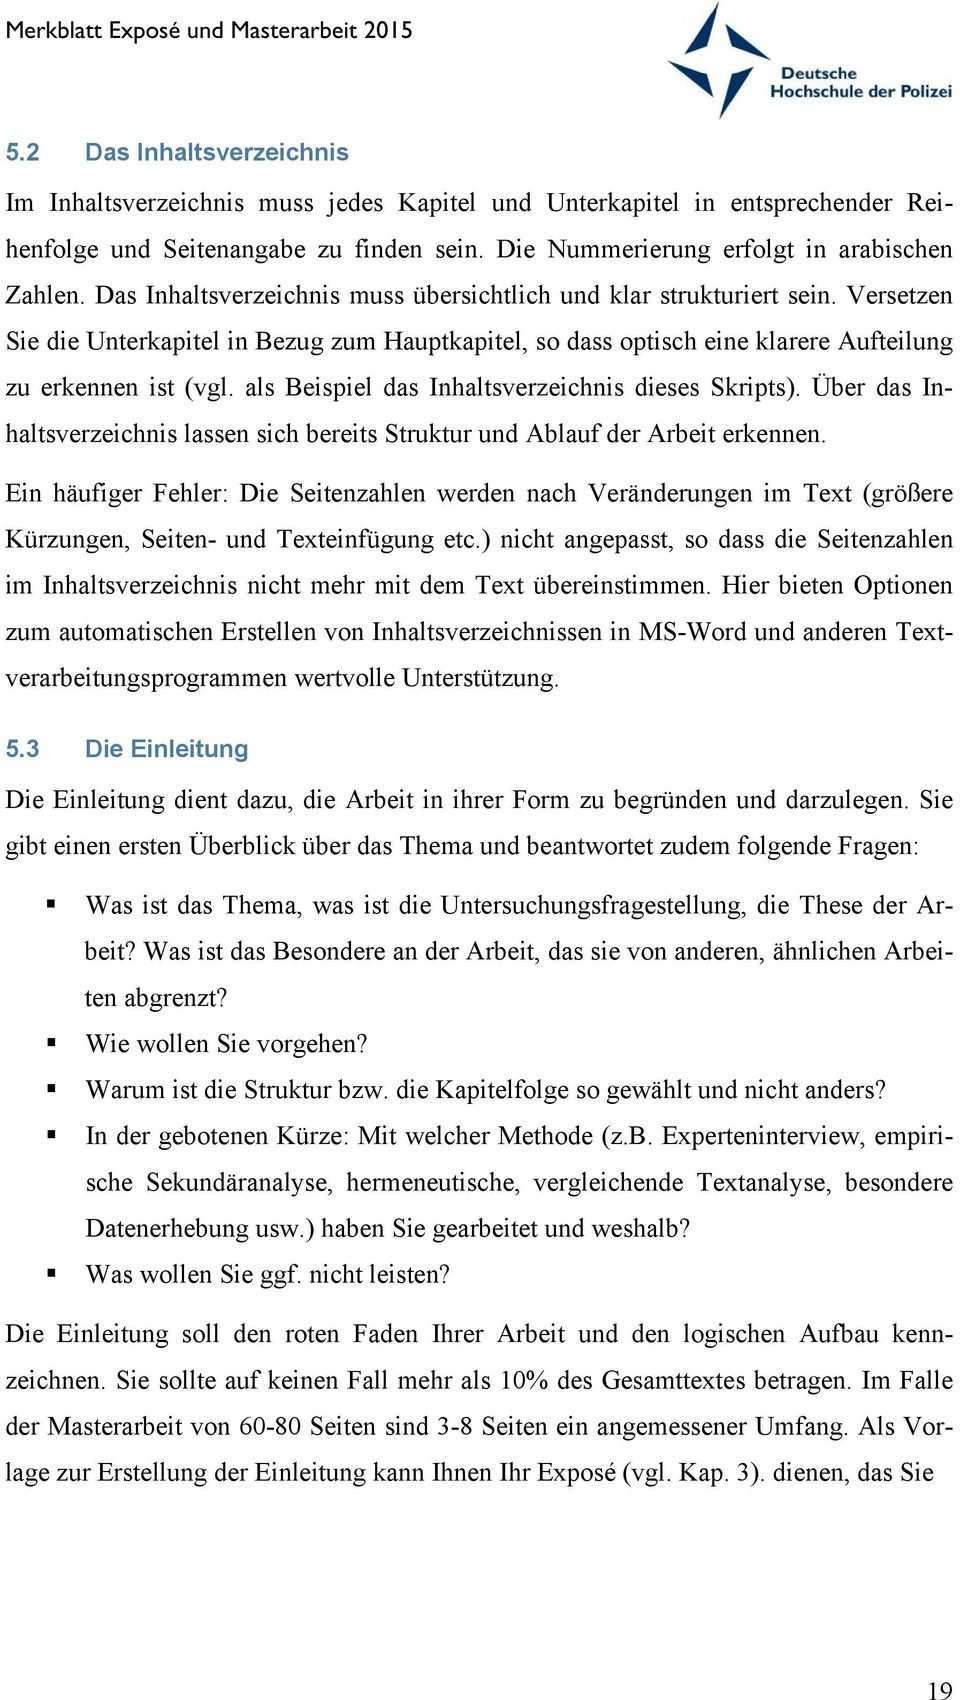 Merkblatt Expose Und Masterarbeit Pdf Free Download